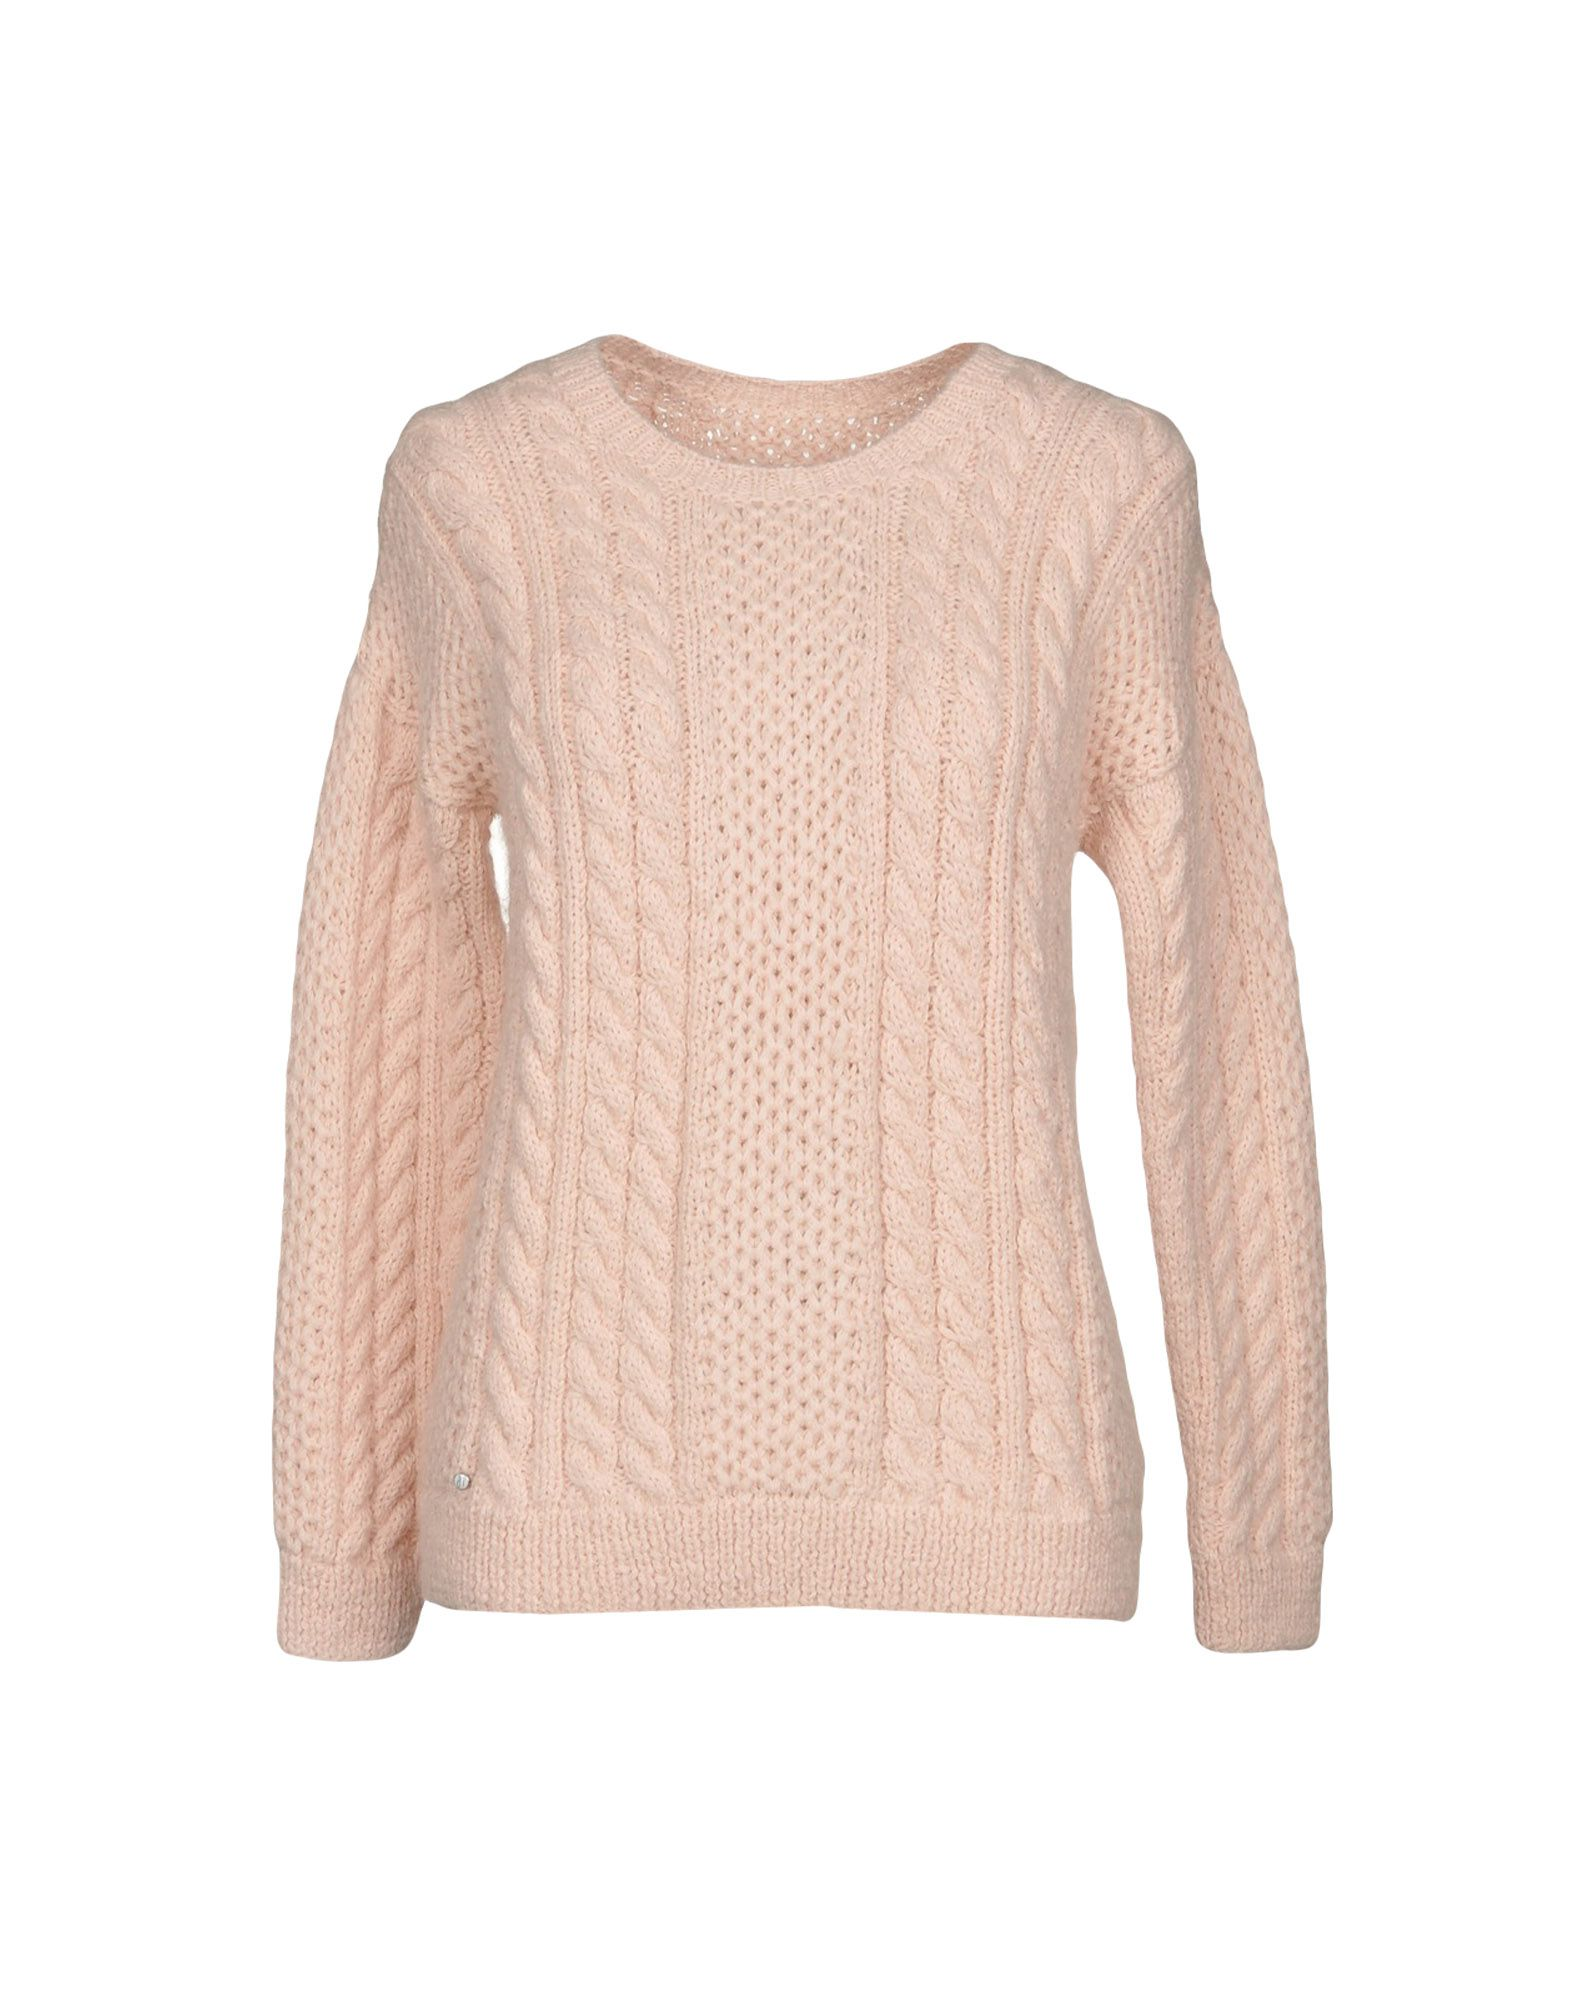 LN | KNITS Свитер angelier coir mattresses thicker knits 1 21 5 1 8